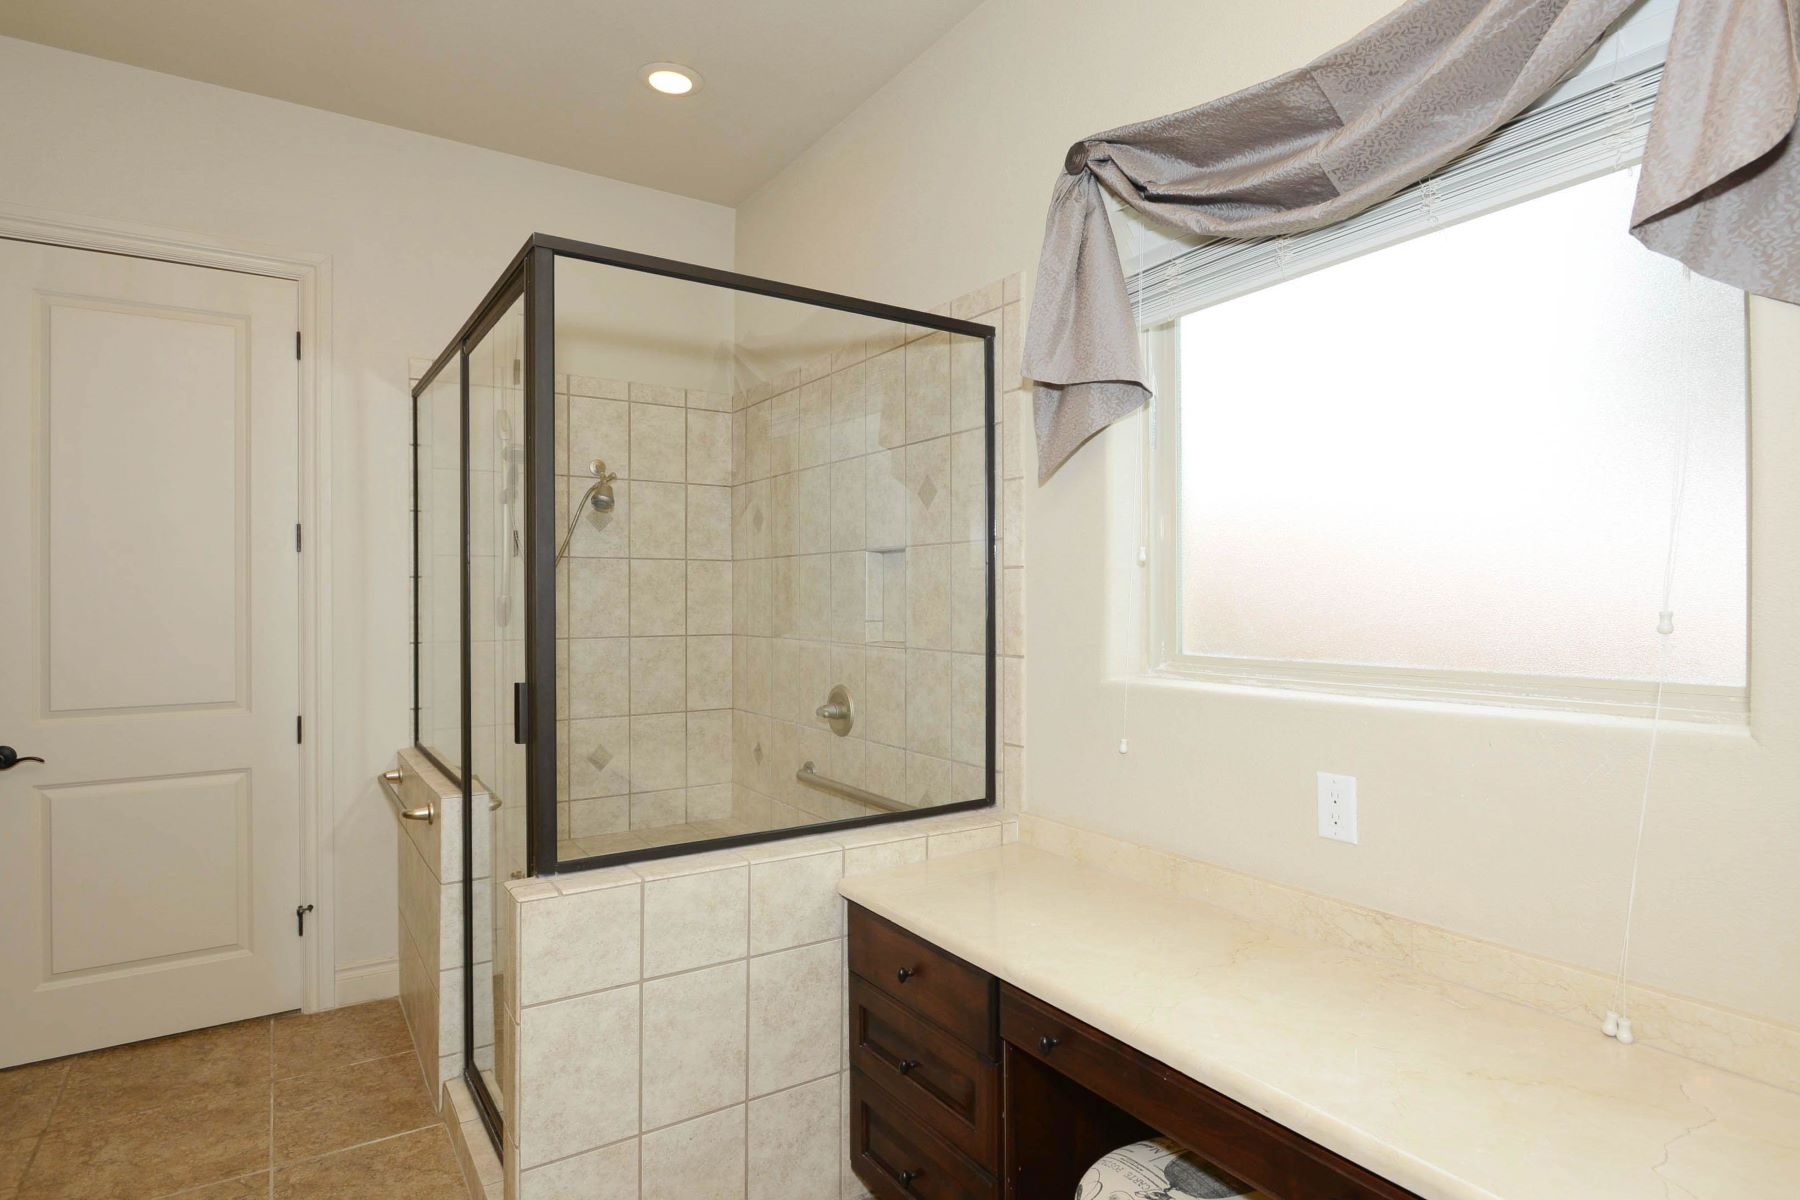 Additional photo for property listing at 8 Dominion Dr # 116 8 Dominion Dr #116 San Antonio, Texas 78257 Estados Unidos